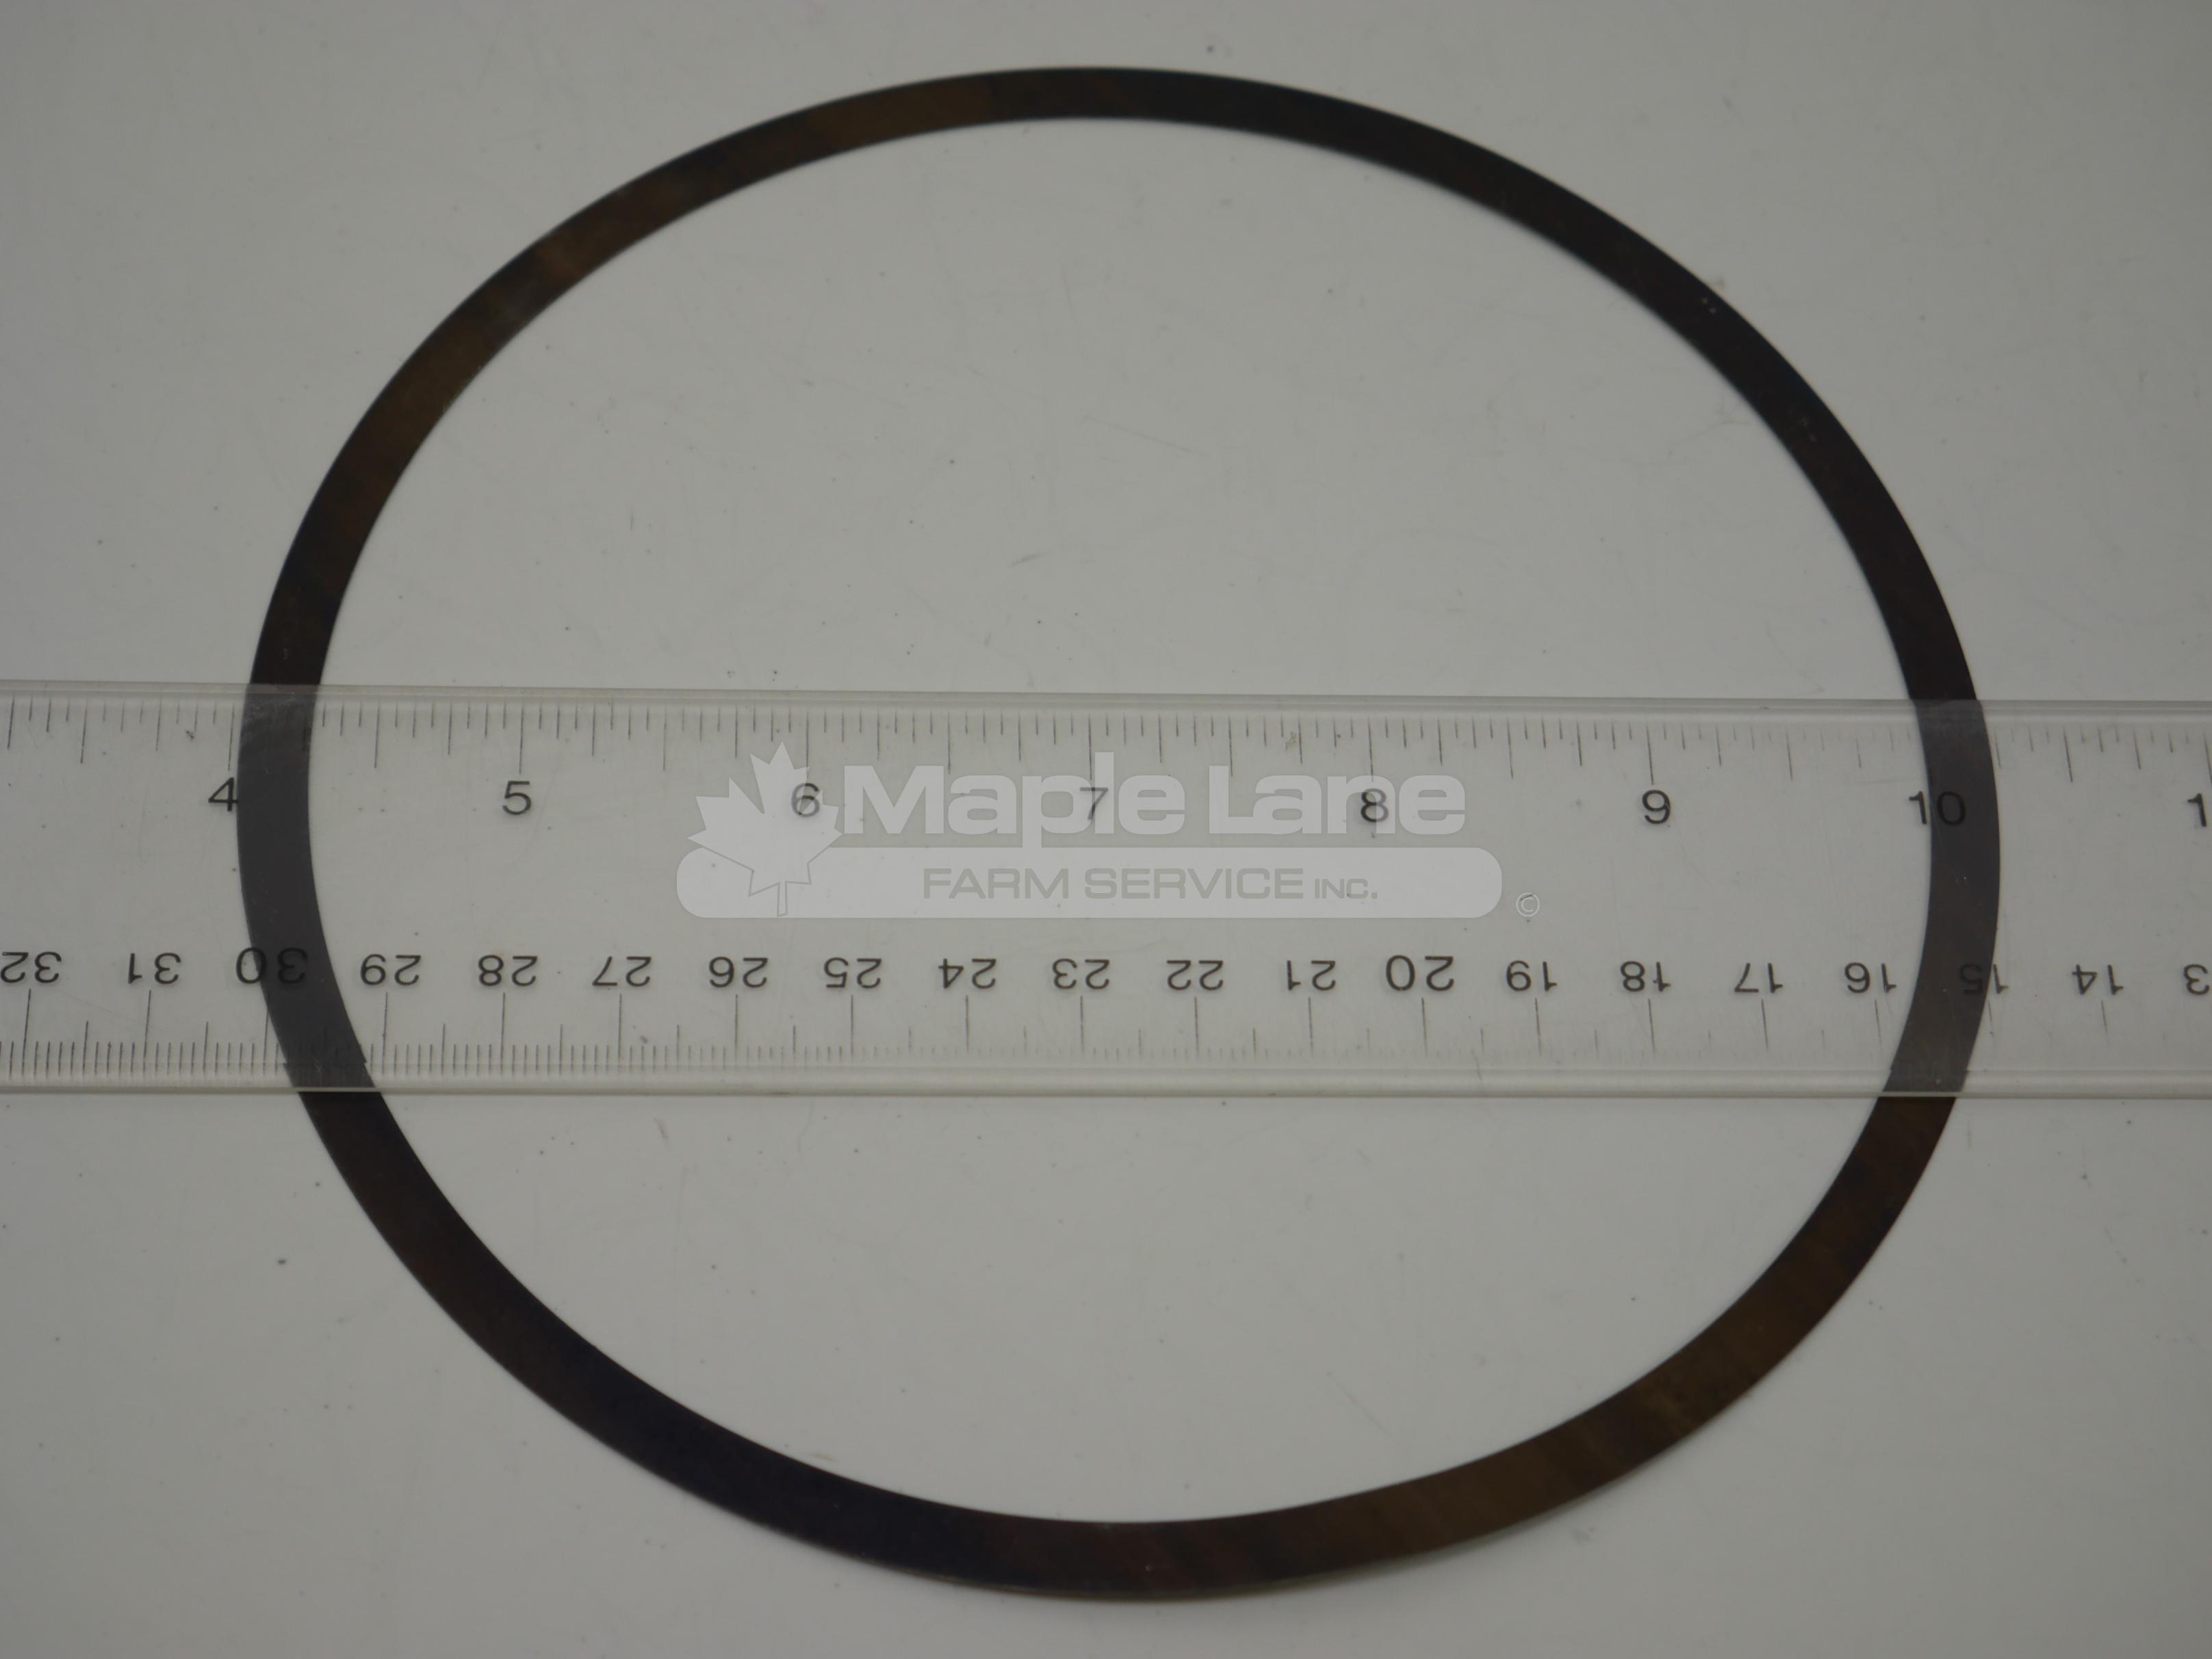 72311965 Spacer Shim 0.20mm